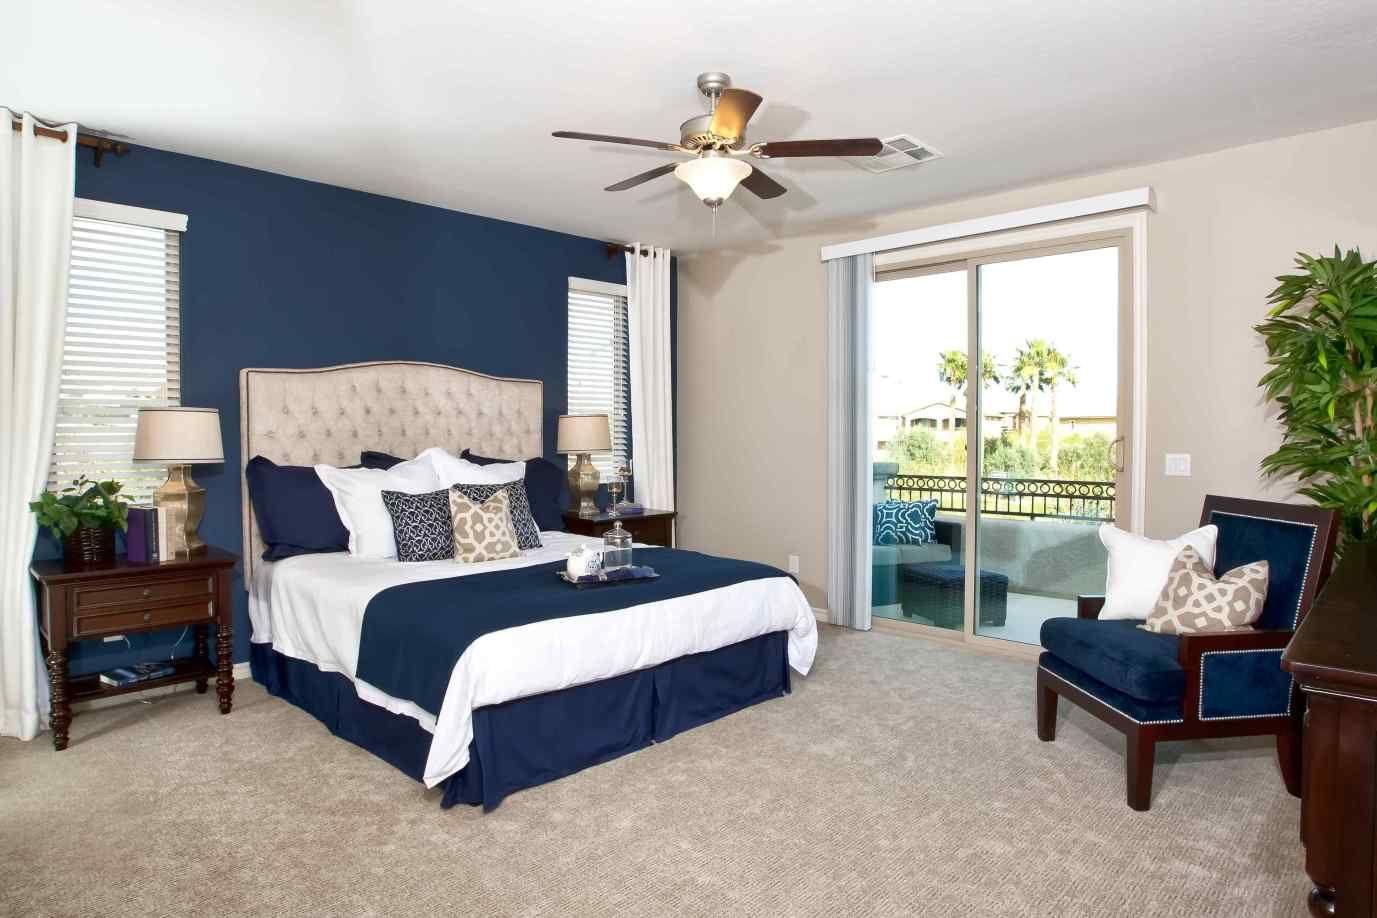 11+ Types of Unique Nautical Bedroom Ideas Coastal Style Boy Rooms